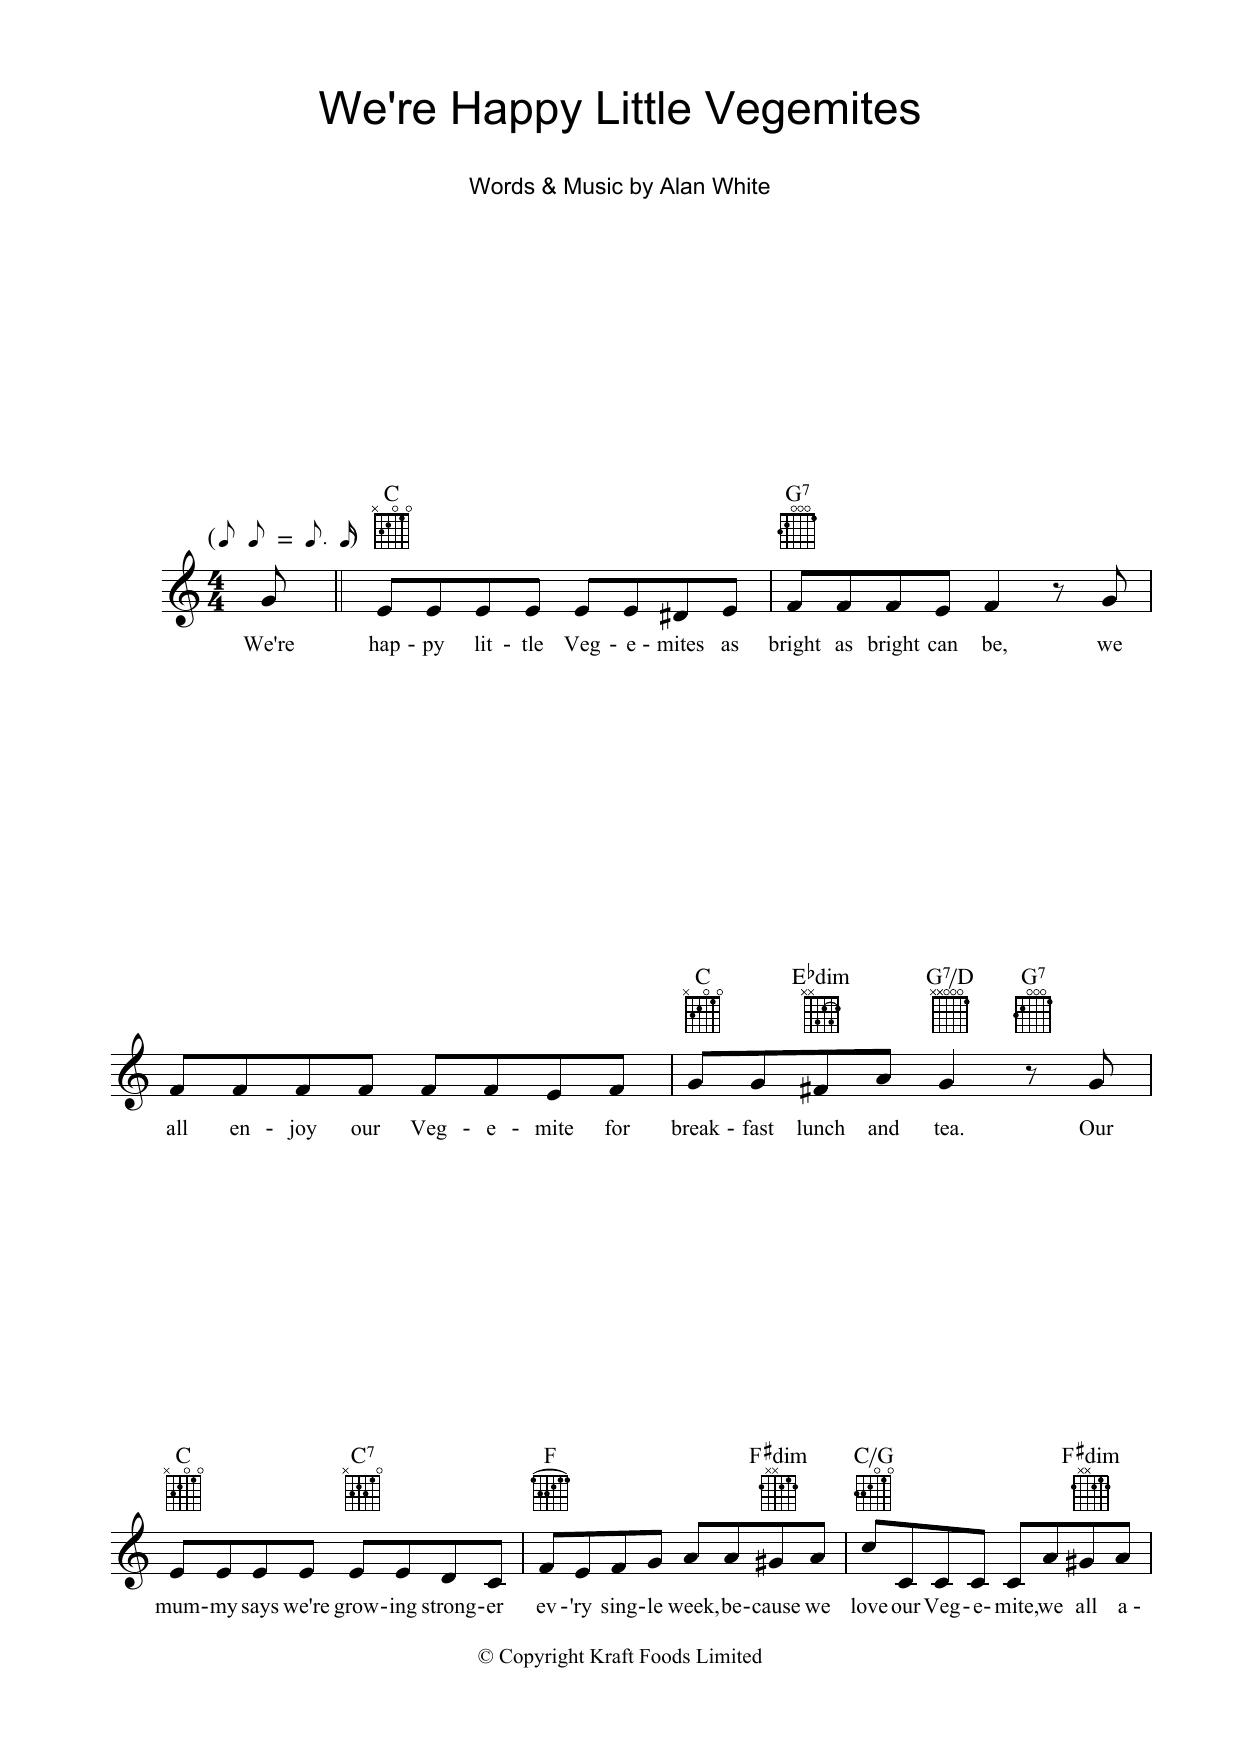 We're Happy Little Vegemites Sheet Music